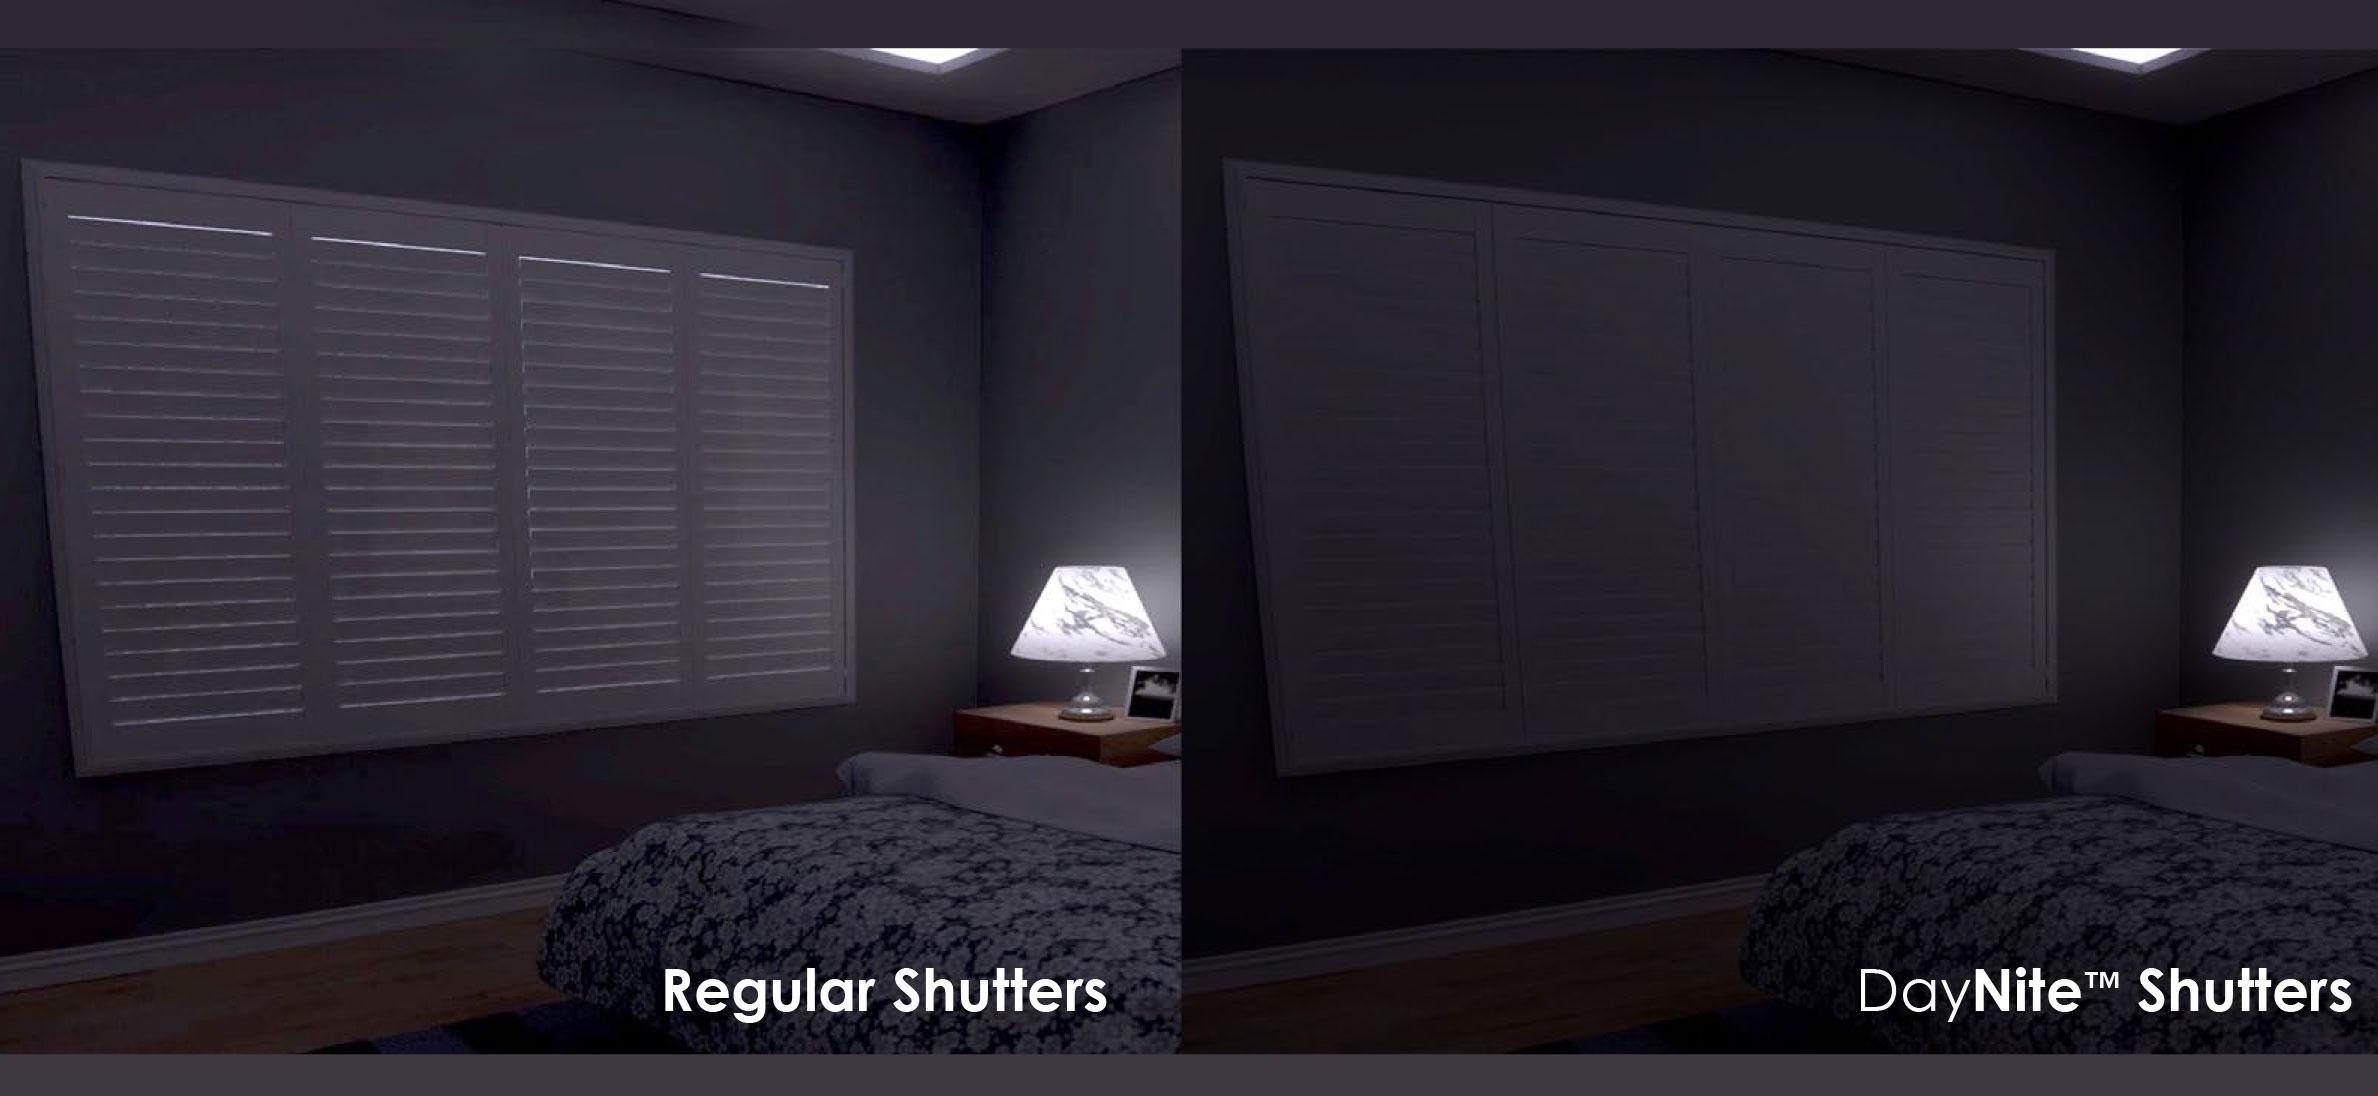 DayNite Shutter